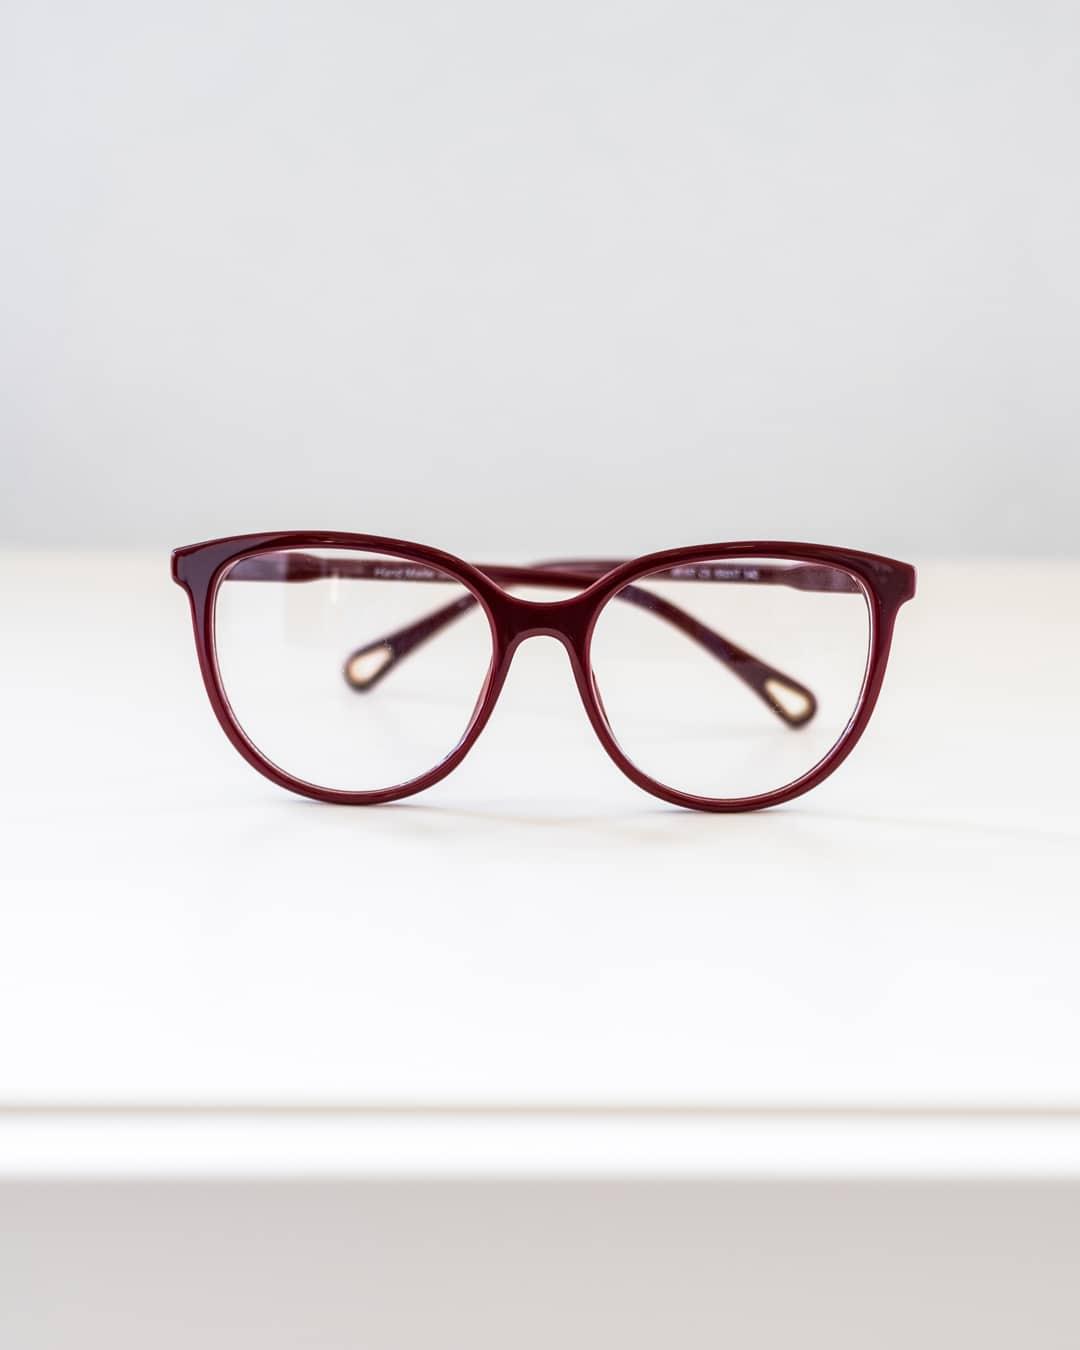 Round Burgundy glasses